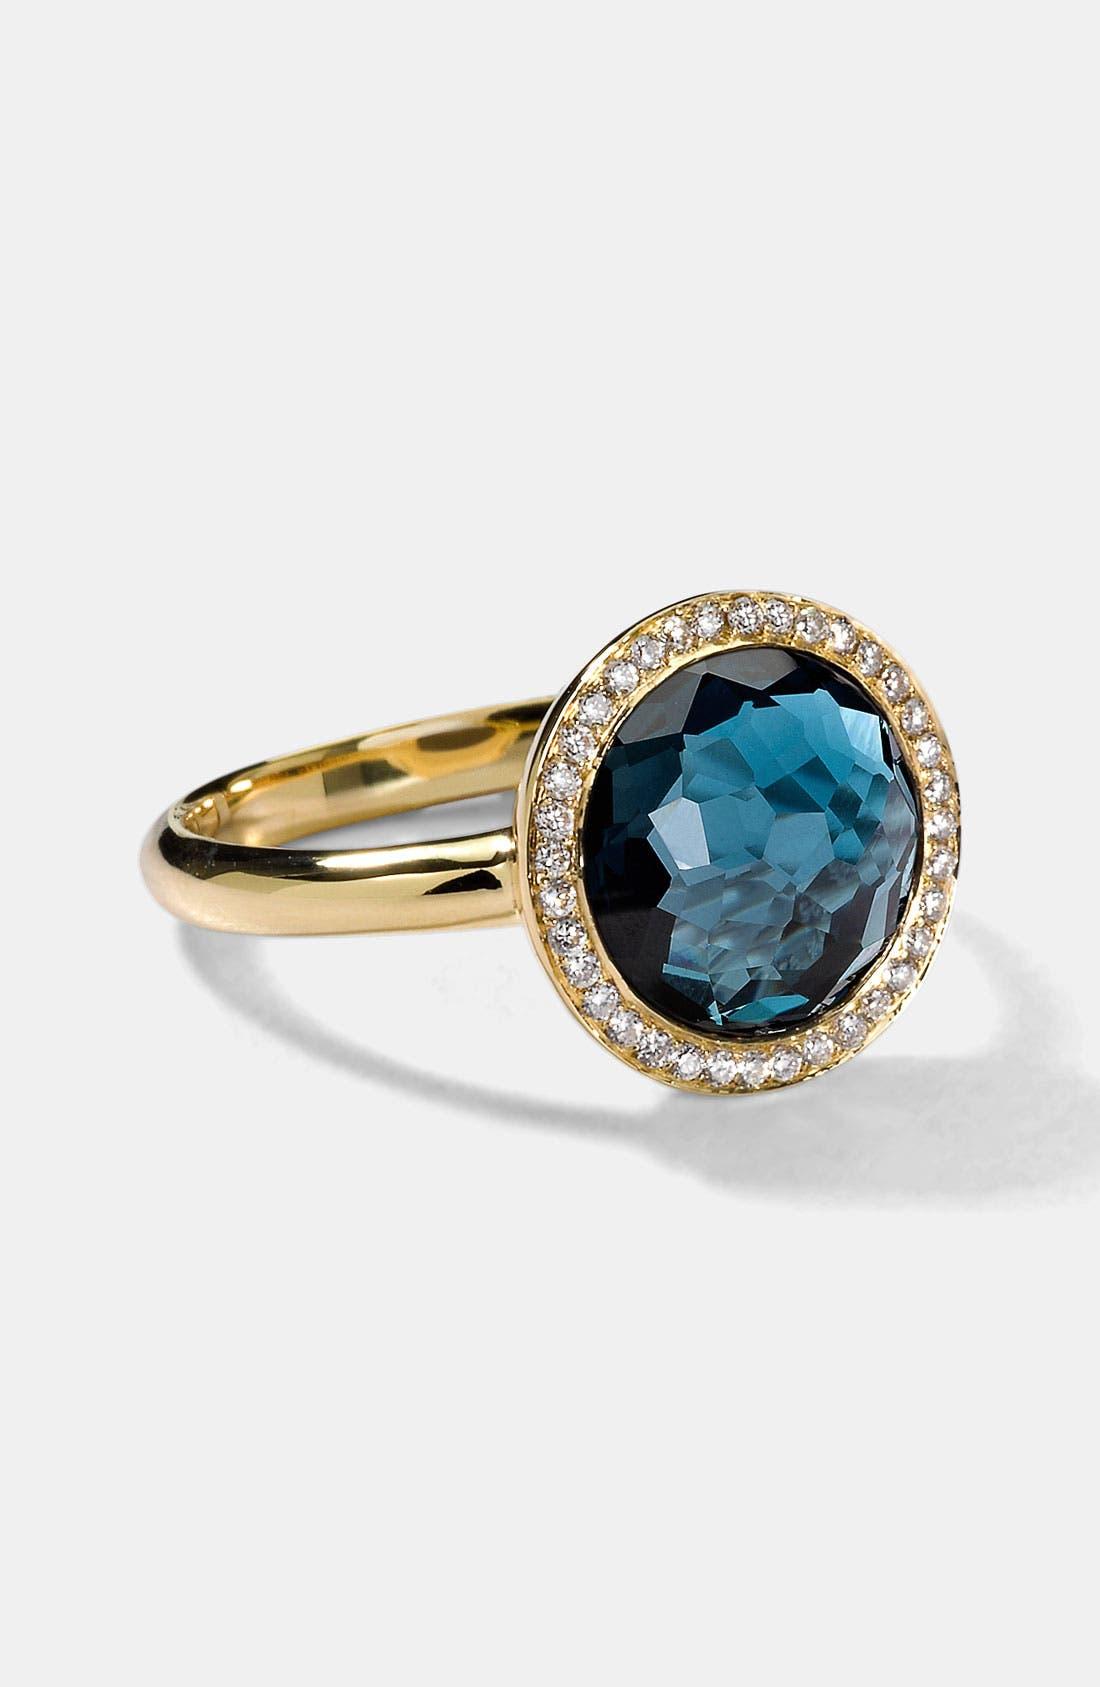 Main Image - Ippolita 'Rock Candy - Lollitini' 18k Gold Ring